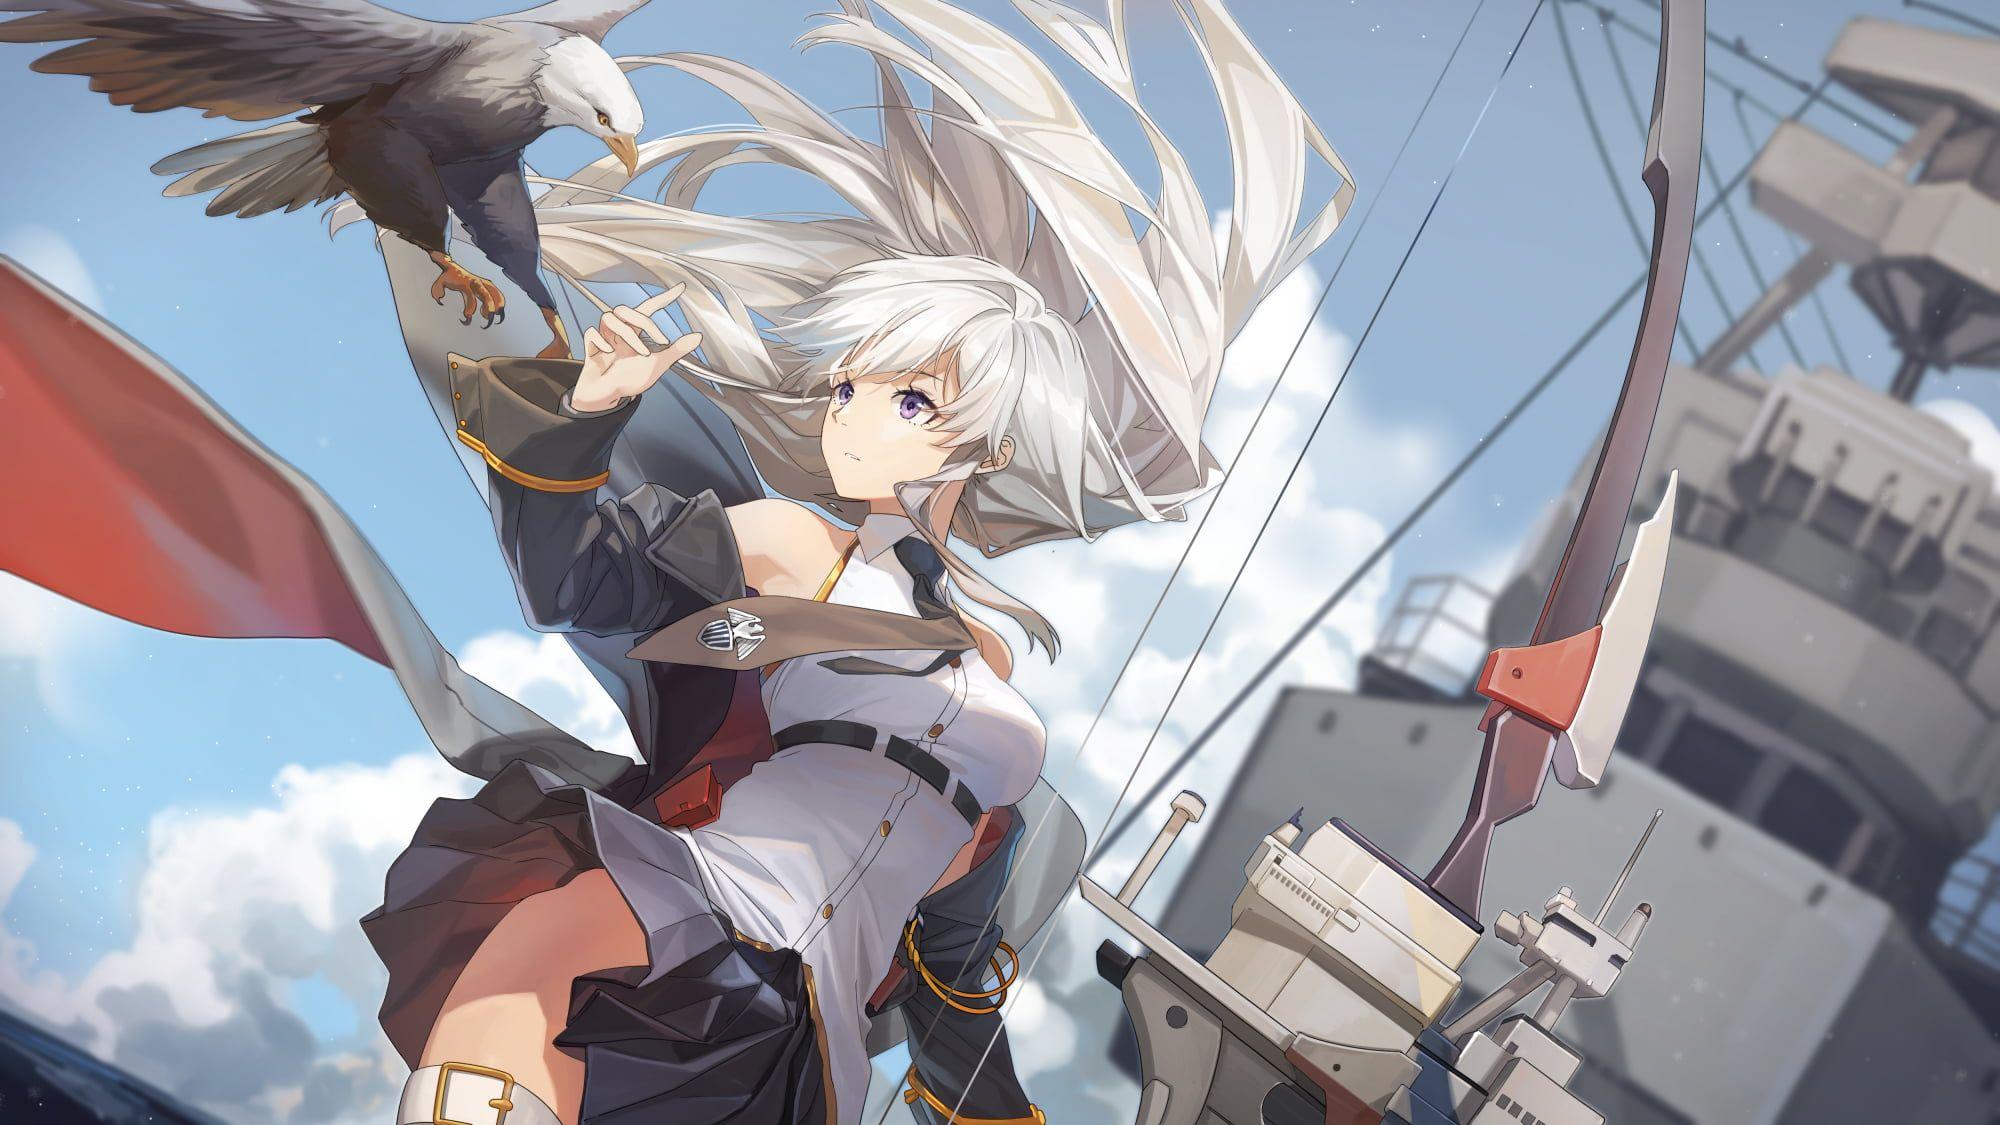 anime anime girls Azur Lane Enterprise (Azur Lane) eagle